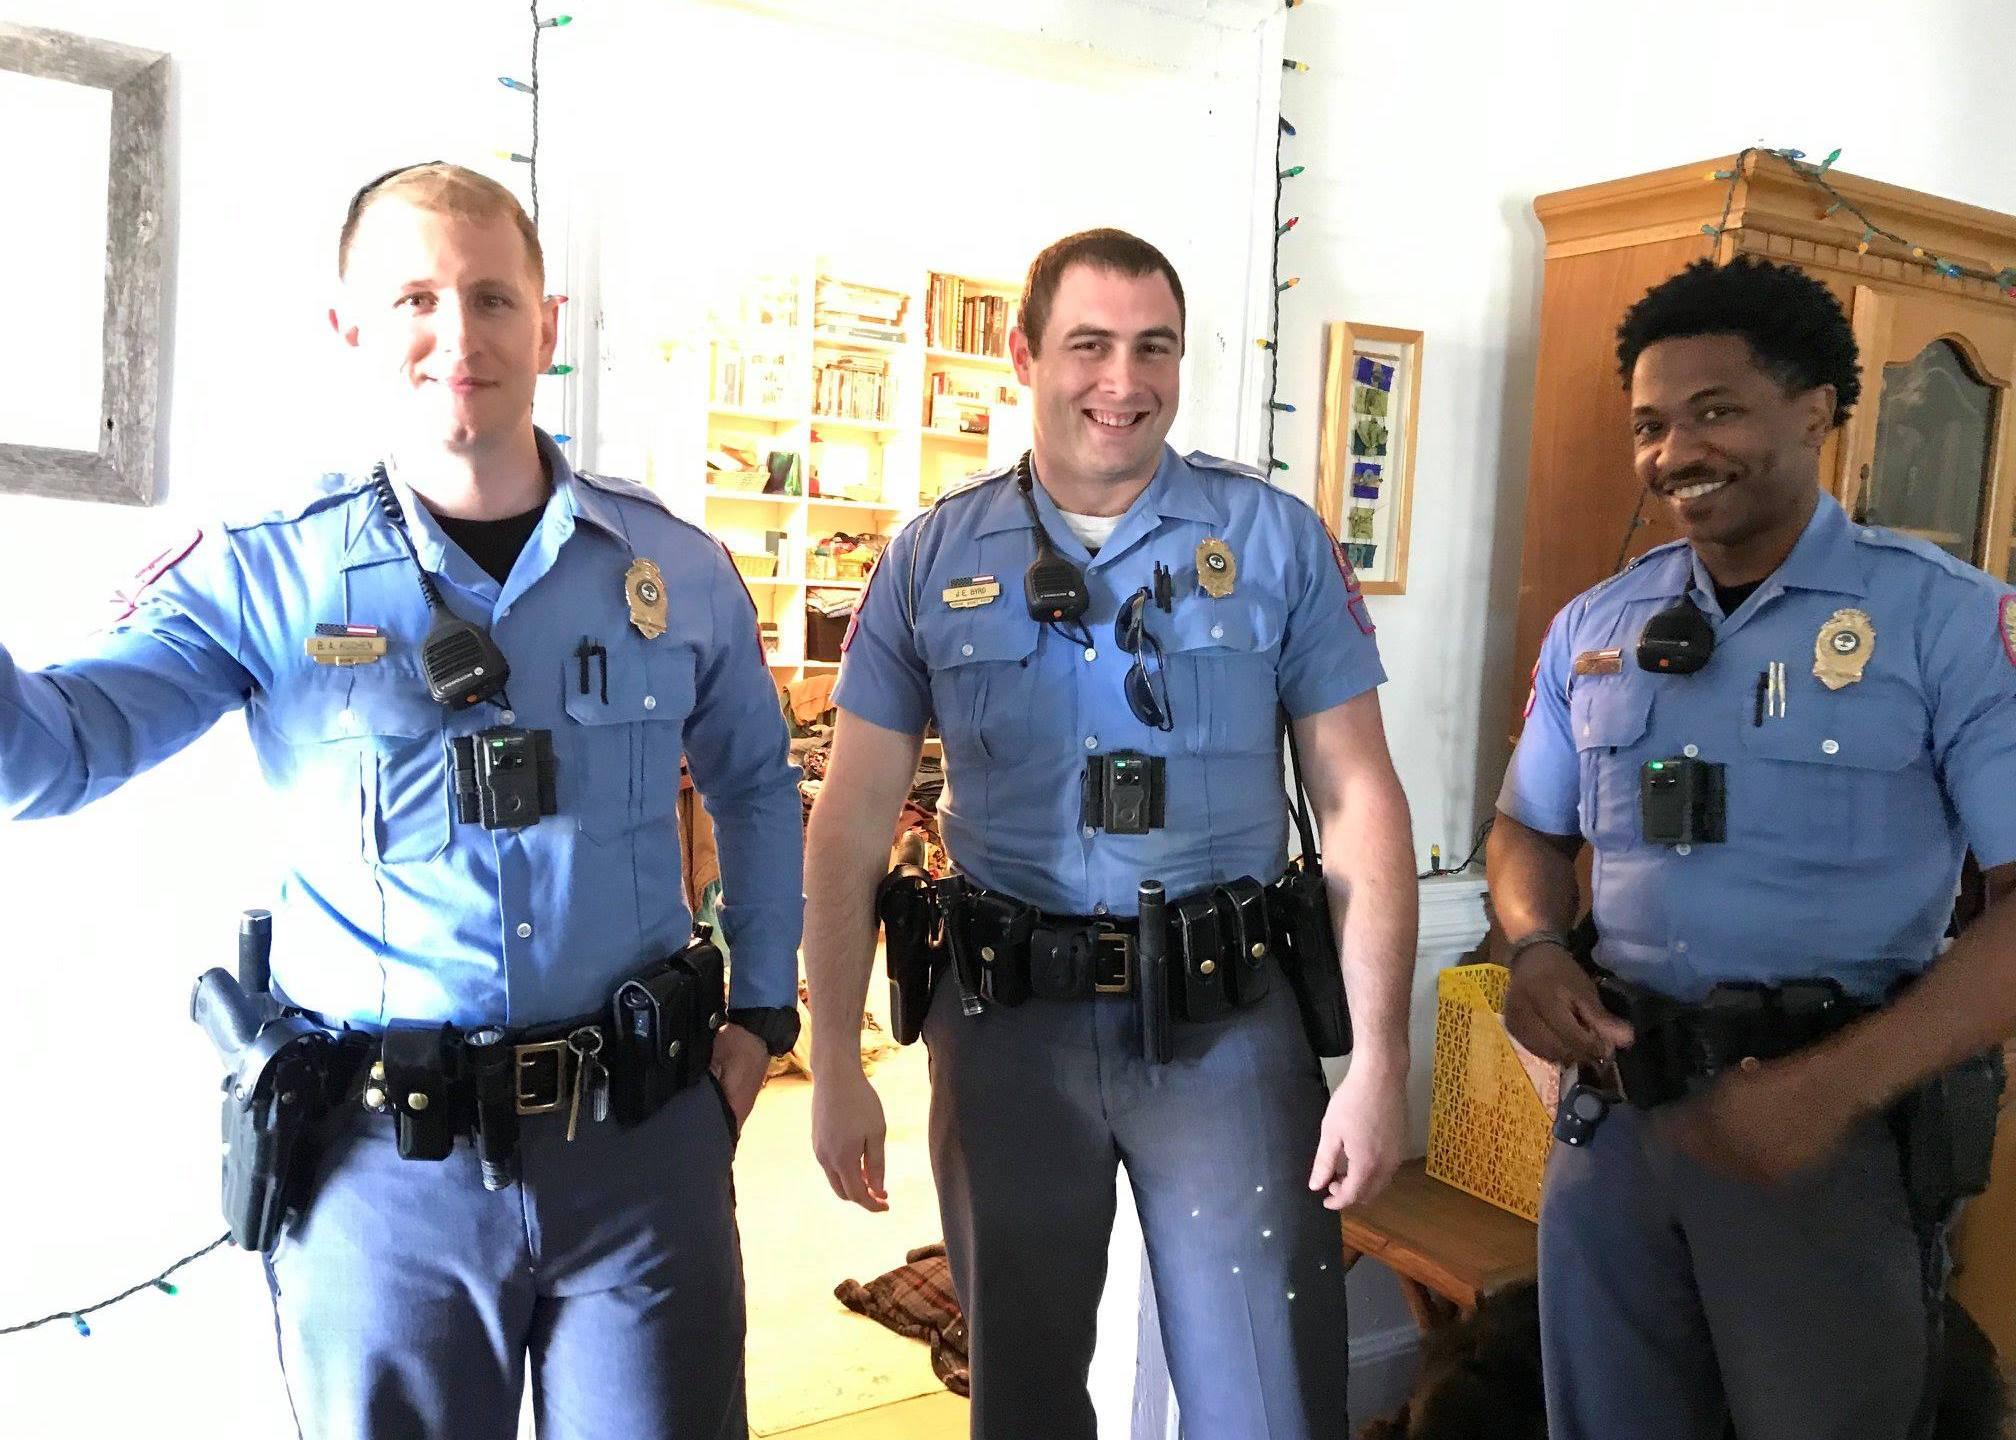 (Raleigh police 1